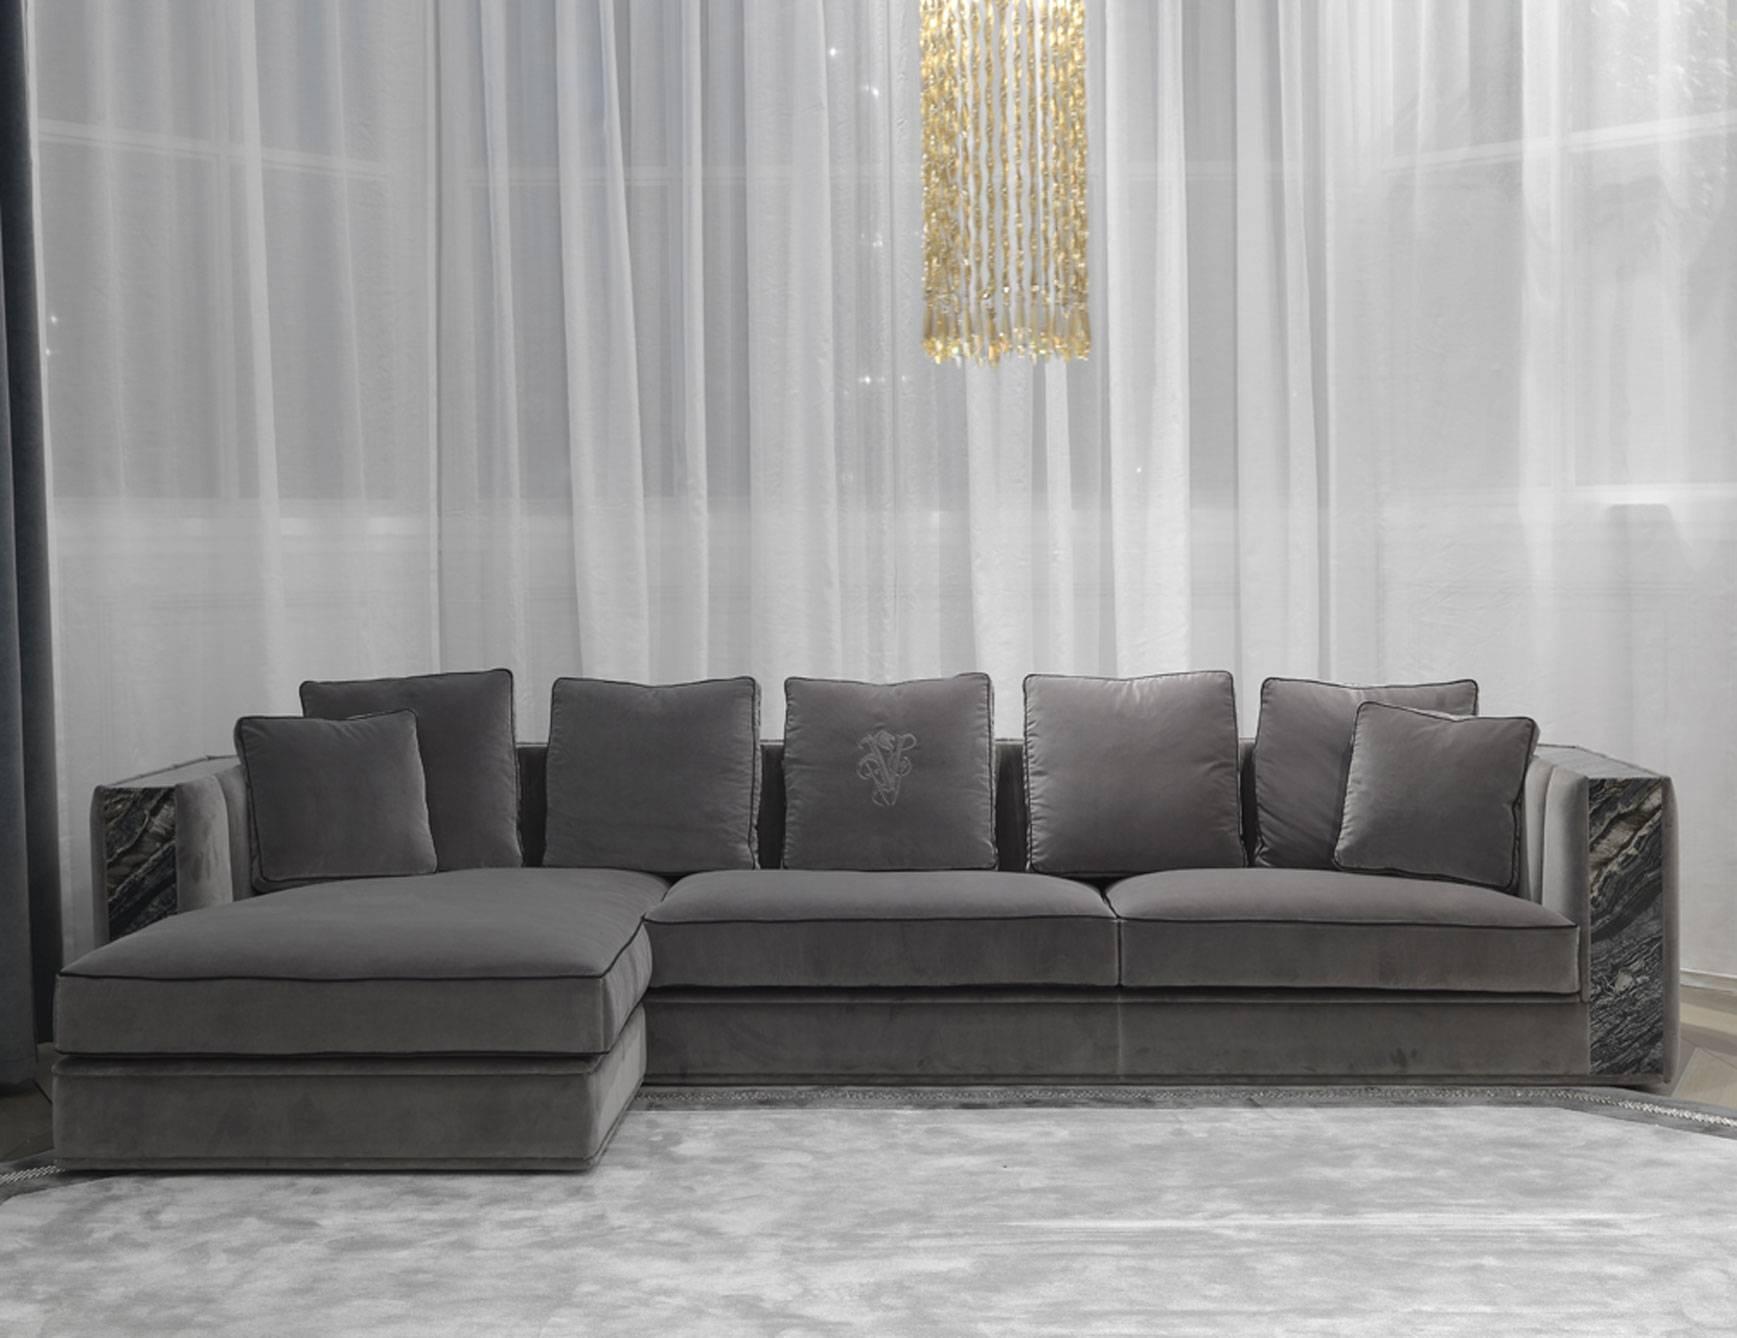 Nella Vetrina Visionnaire Ipe Cavalli Davis Grey Sofa In intended for Davis Sofas (Image 13 of 15)